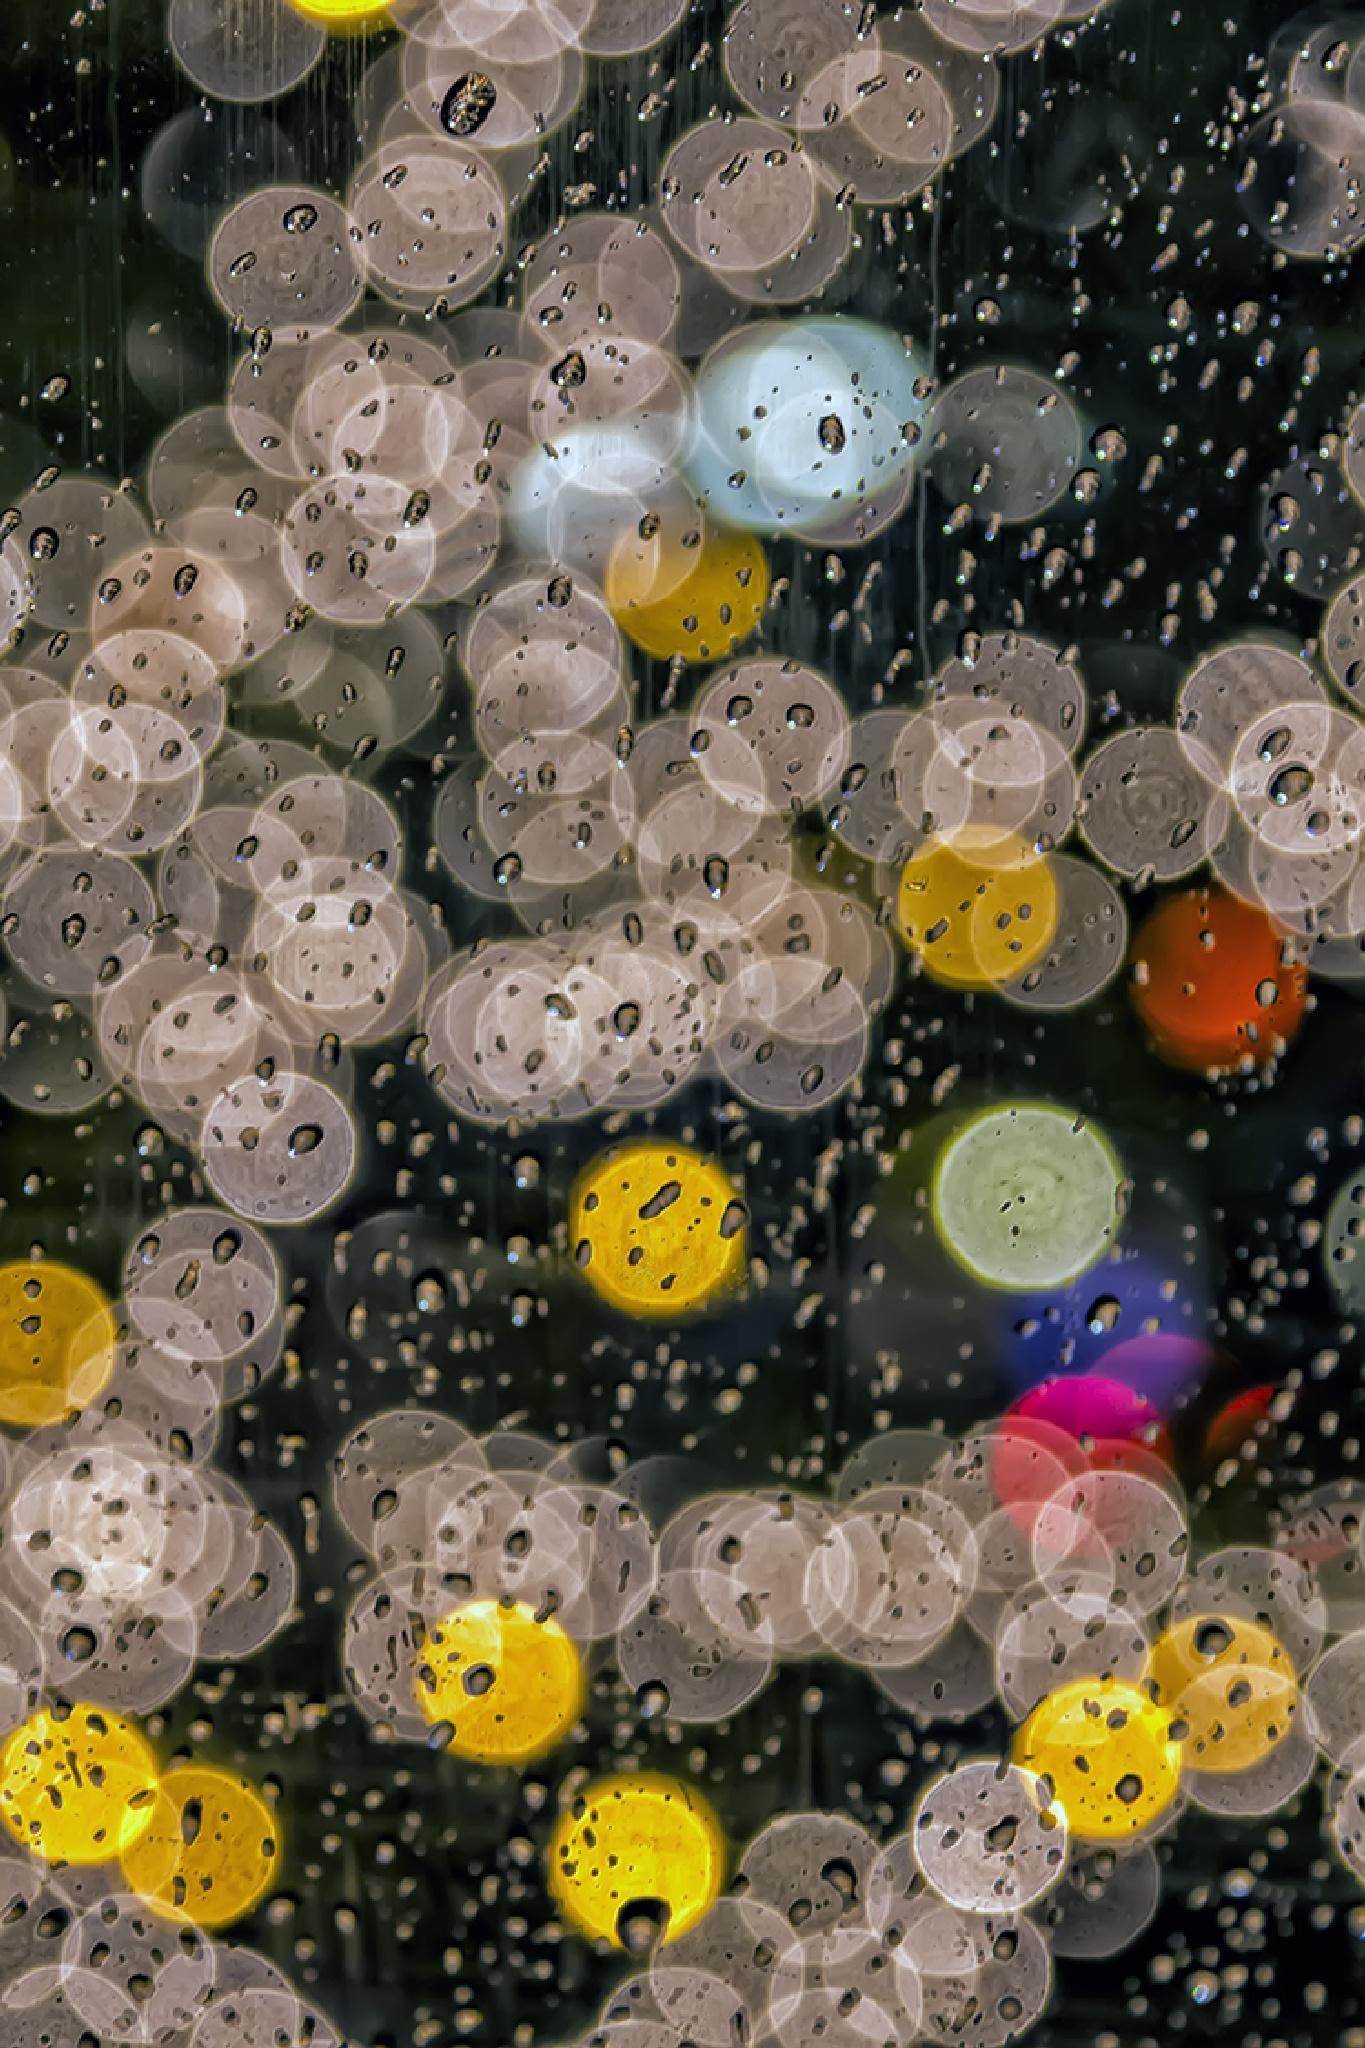 Rain on Cab Window at Night by robertullmann